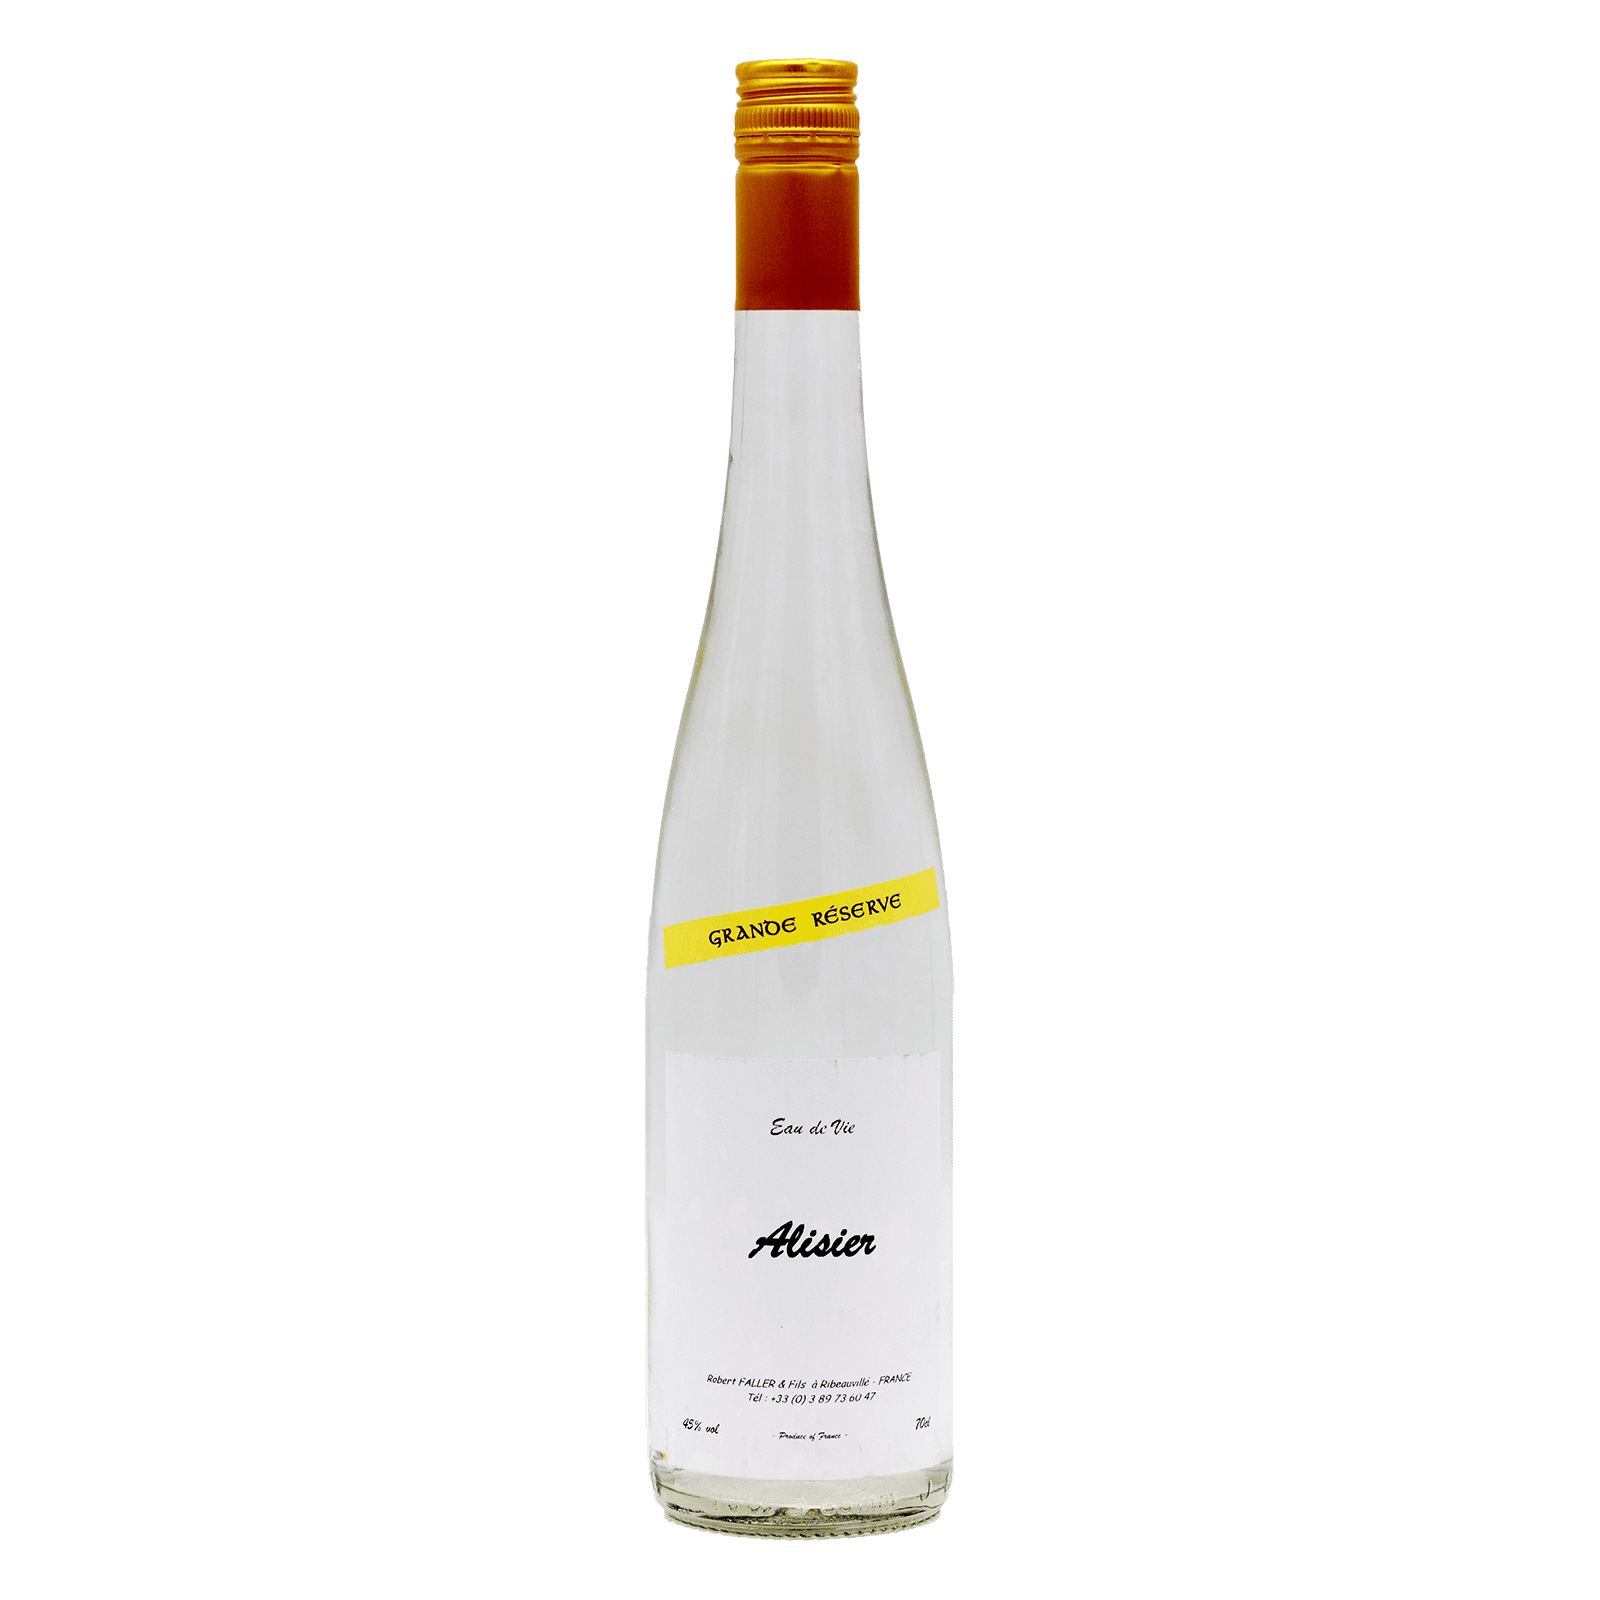 eau-de-vie-alisier